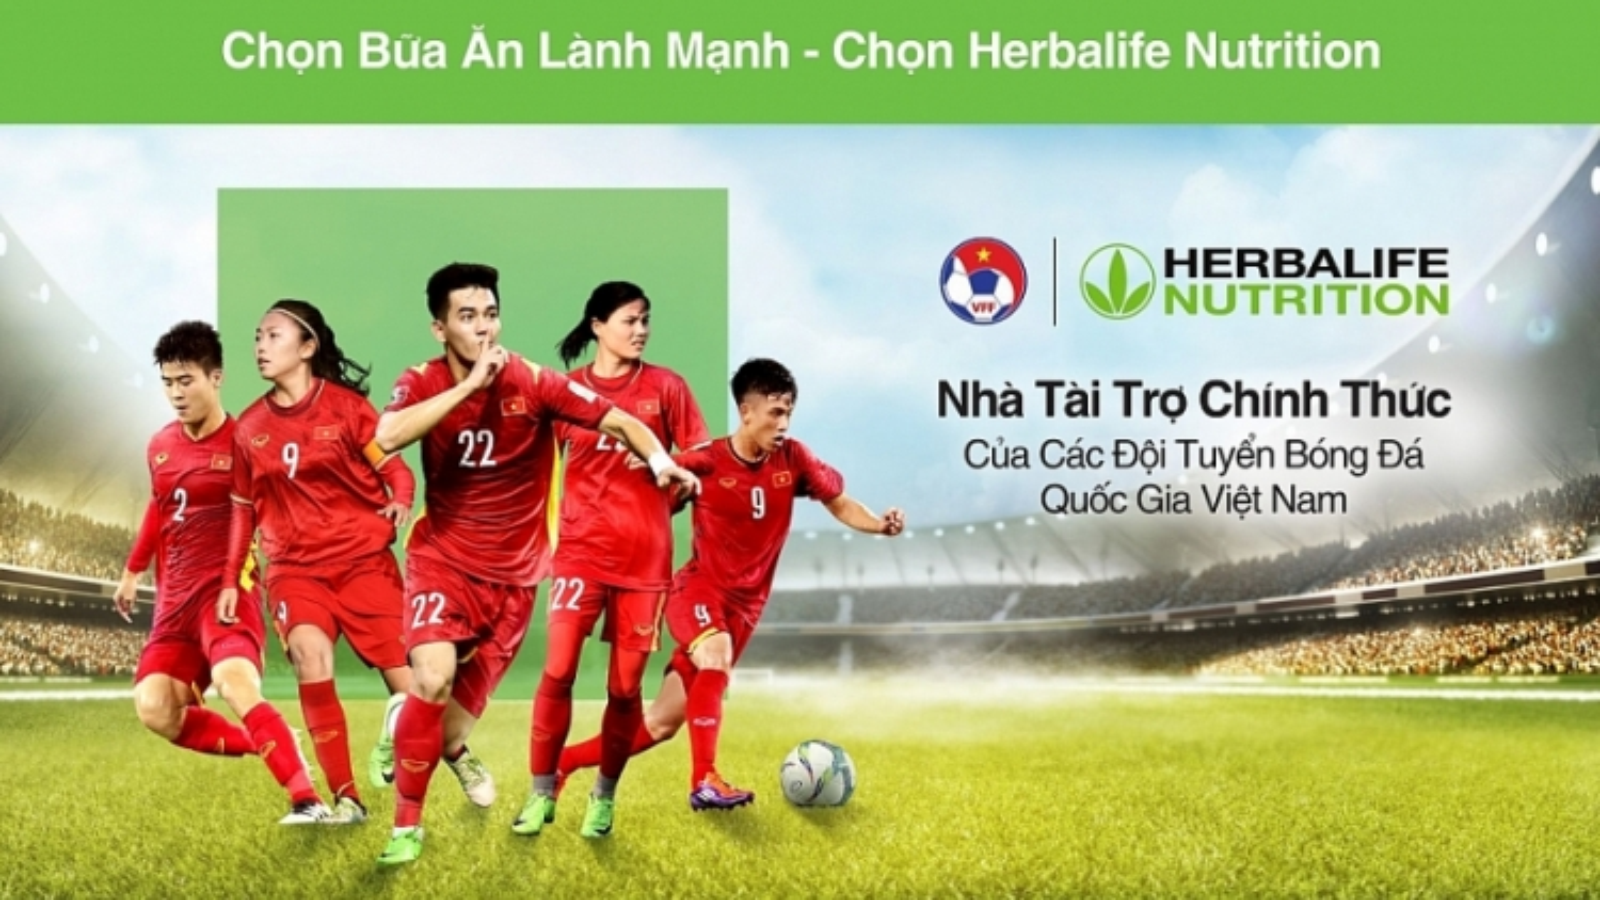 Herbalife Vietnam to sponsor national football team